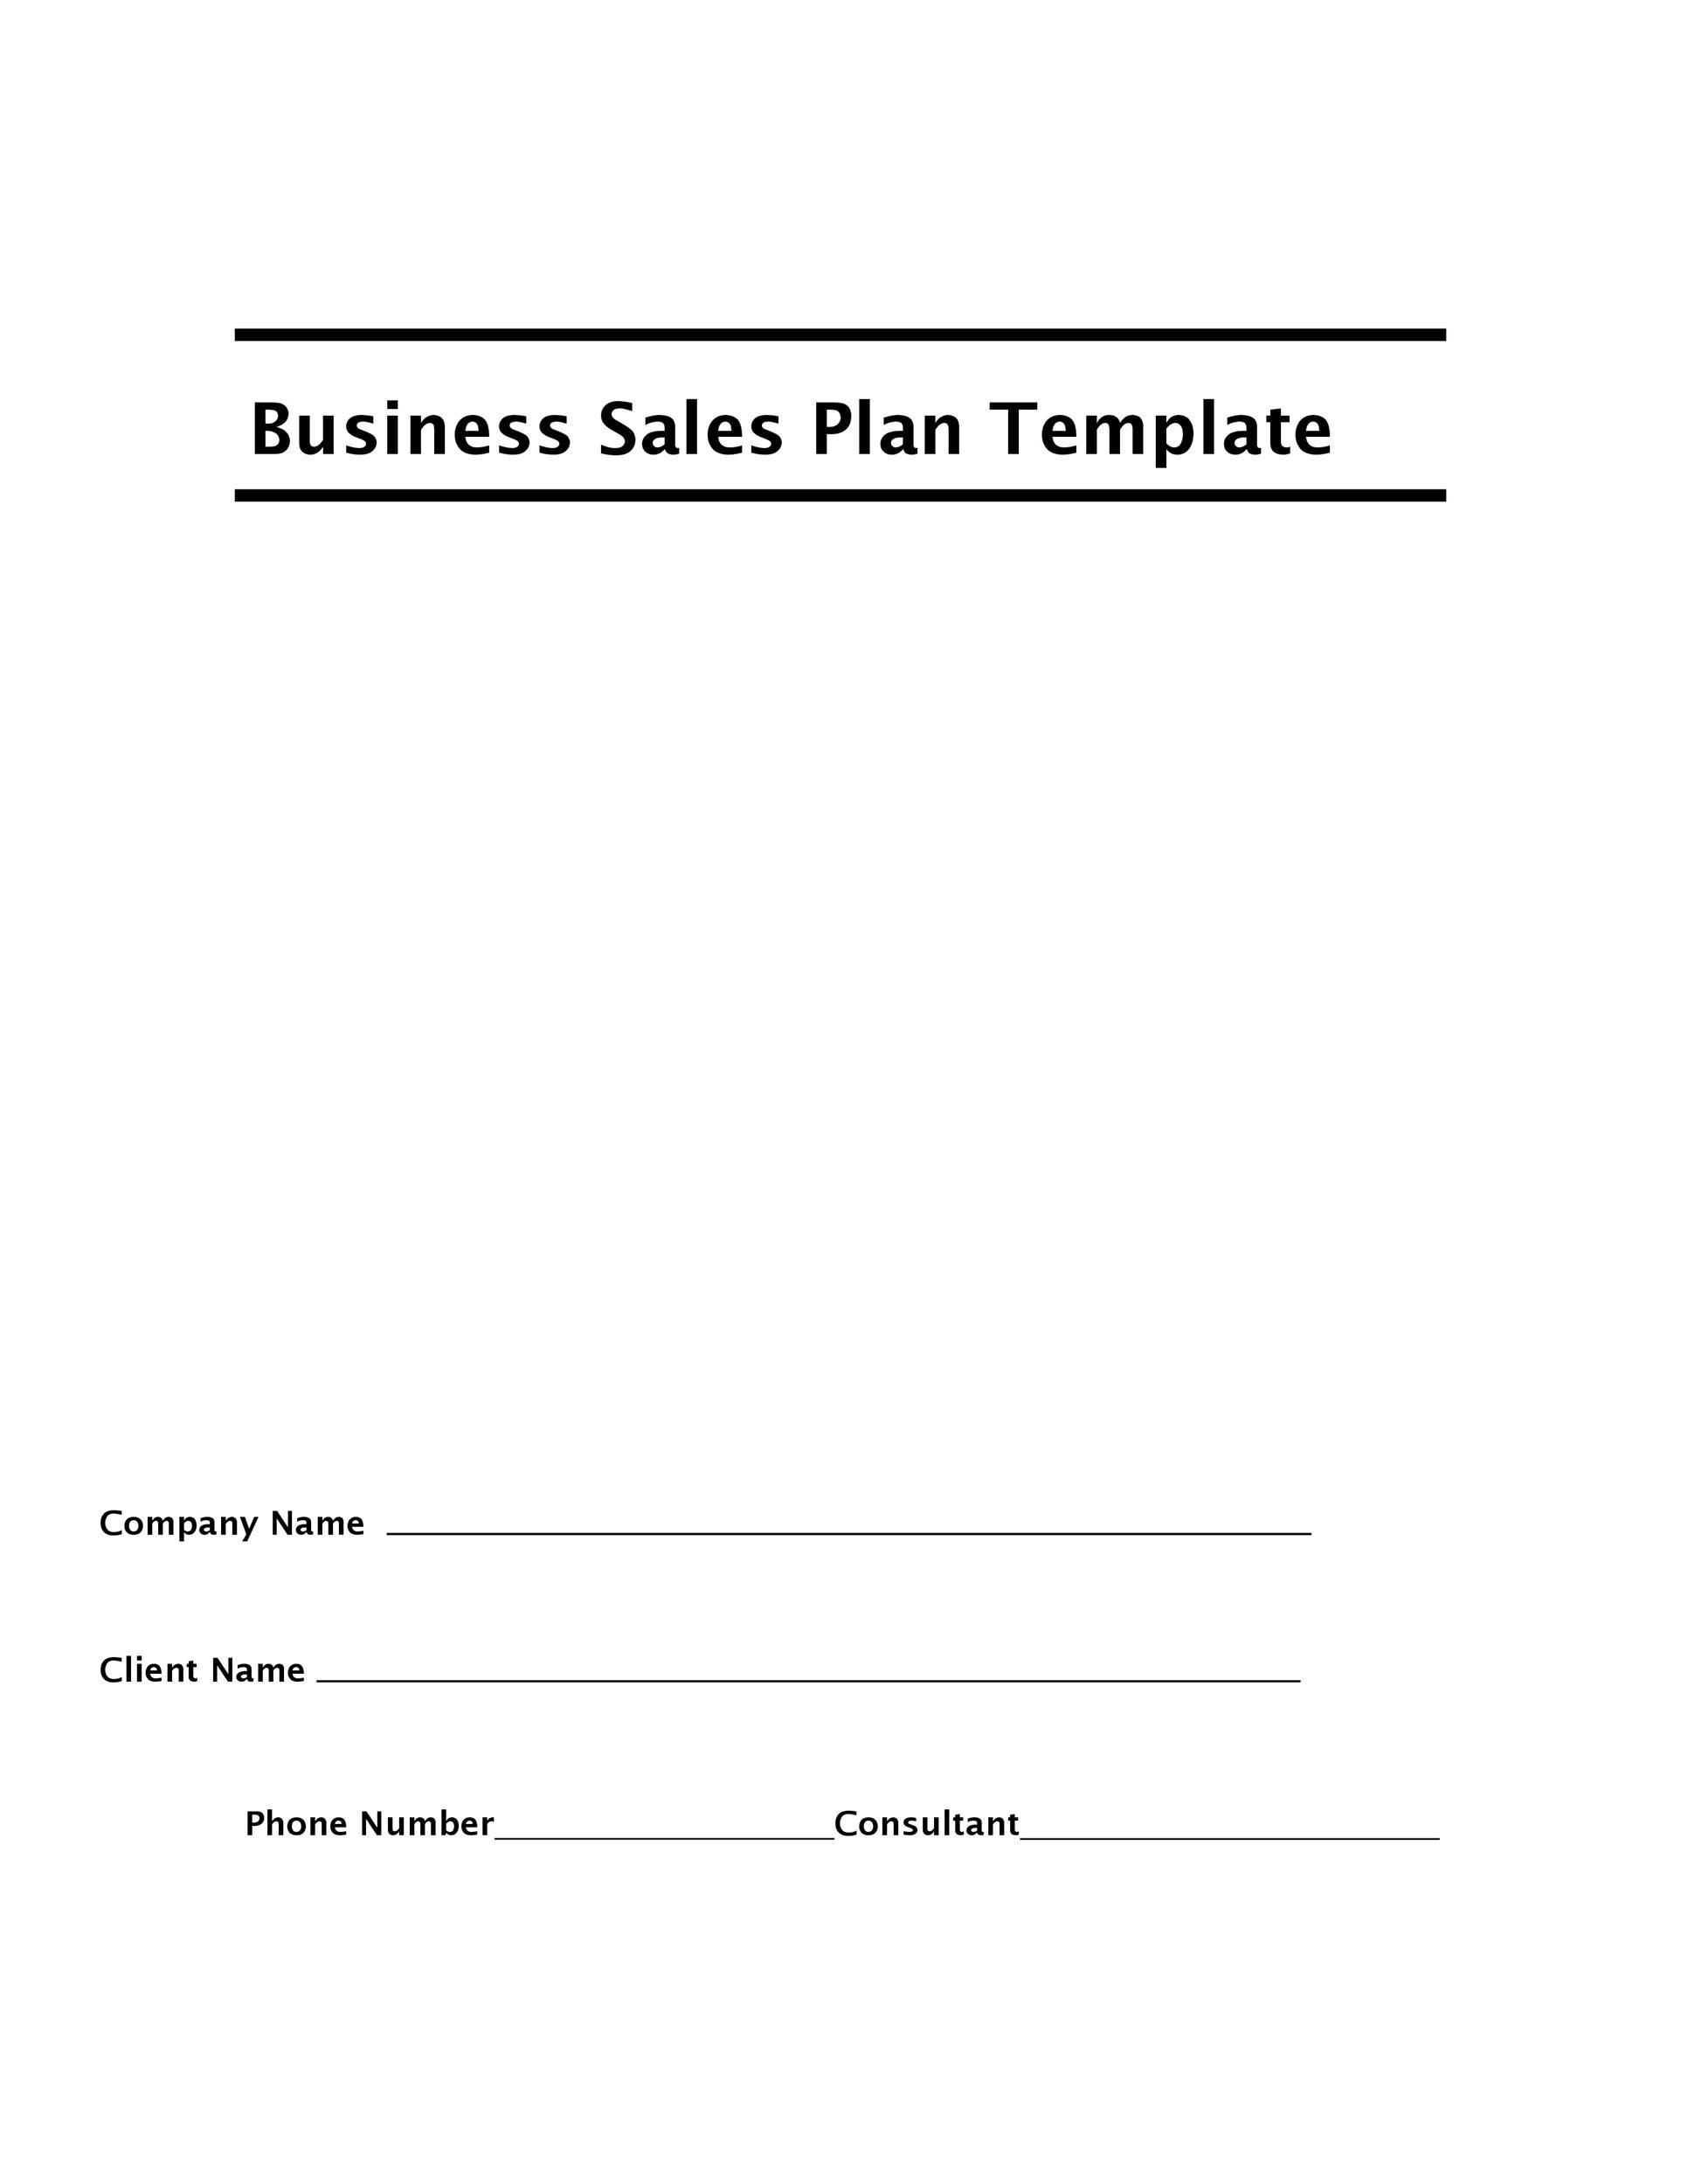 Free Sales Plan Template 25